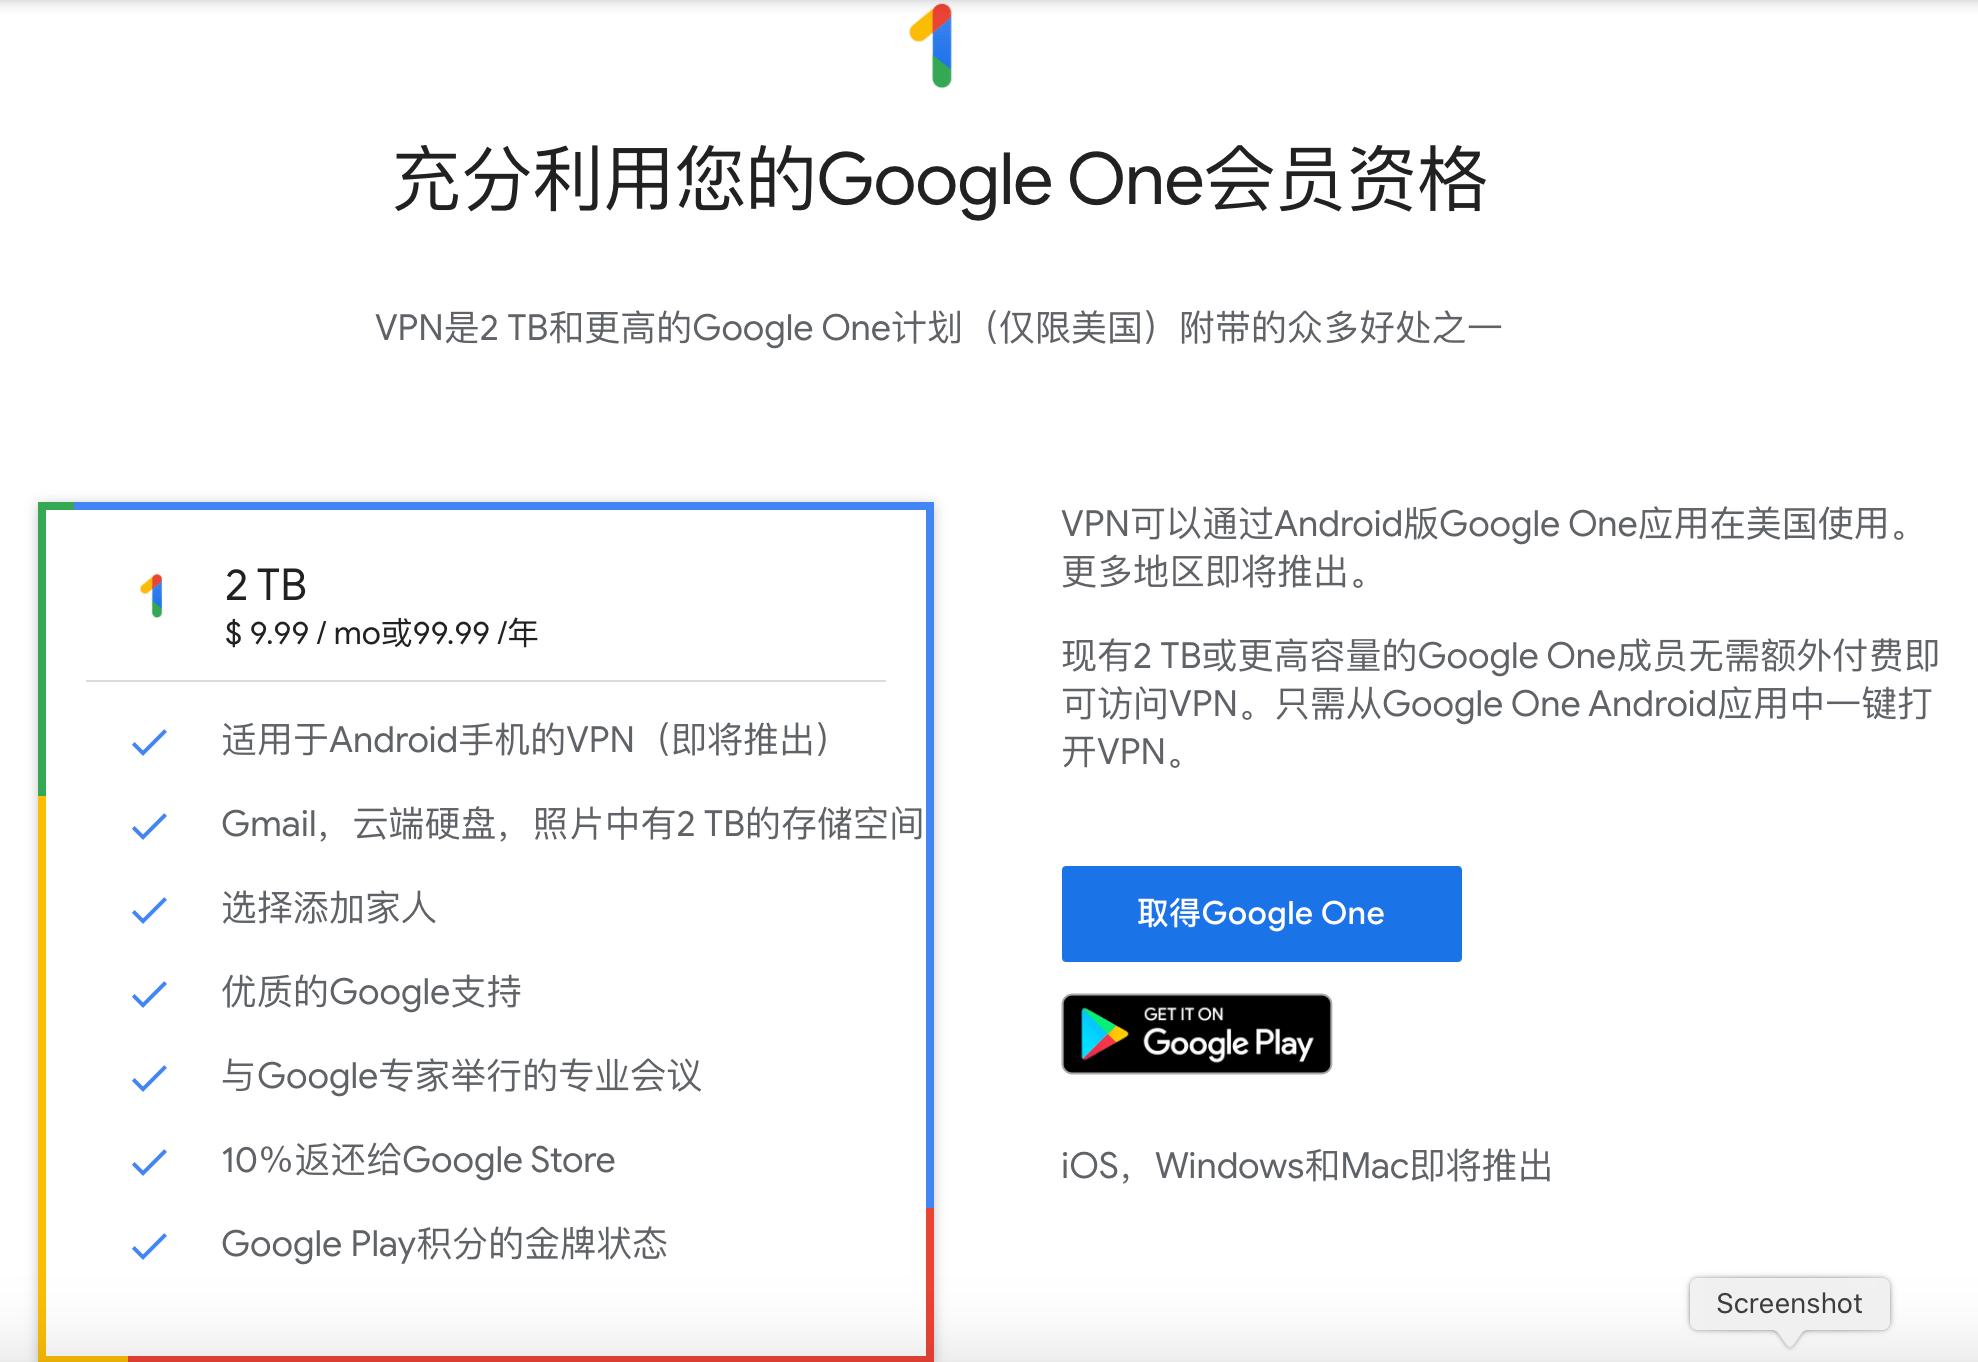 Google one VPN 会员资格及价格 2020-10-30 at 10.33.02